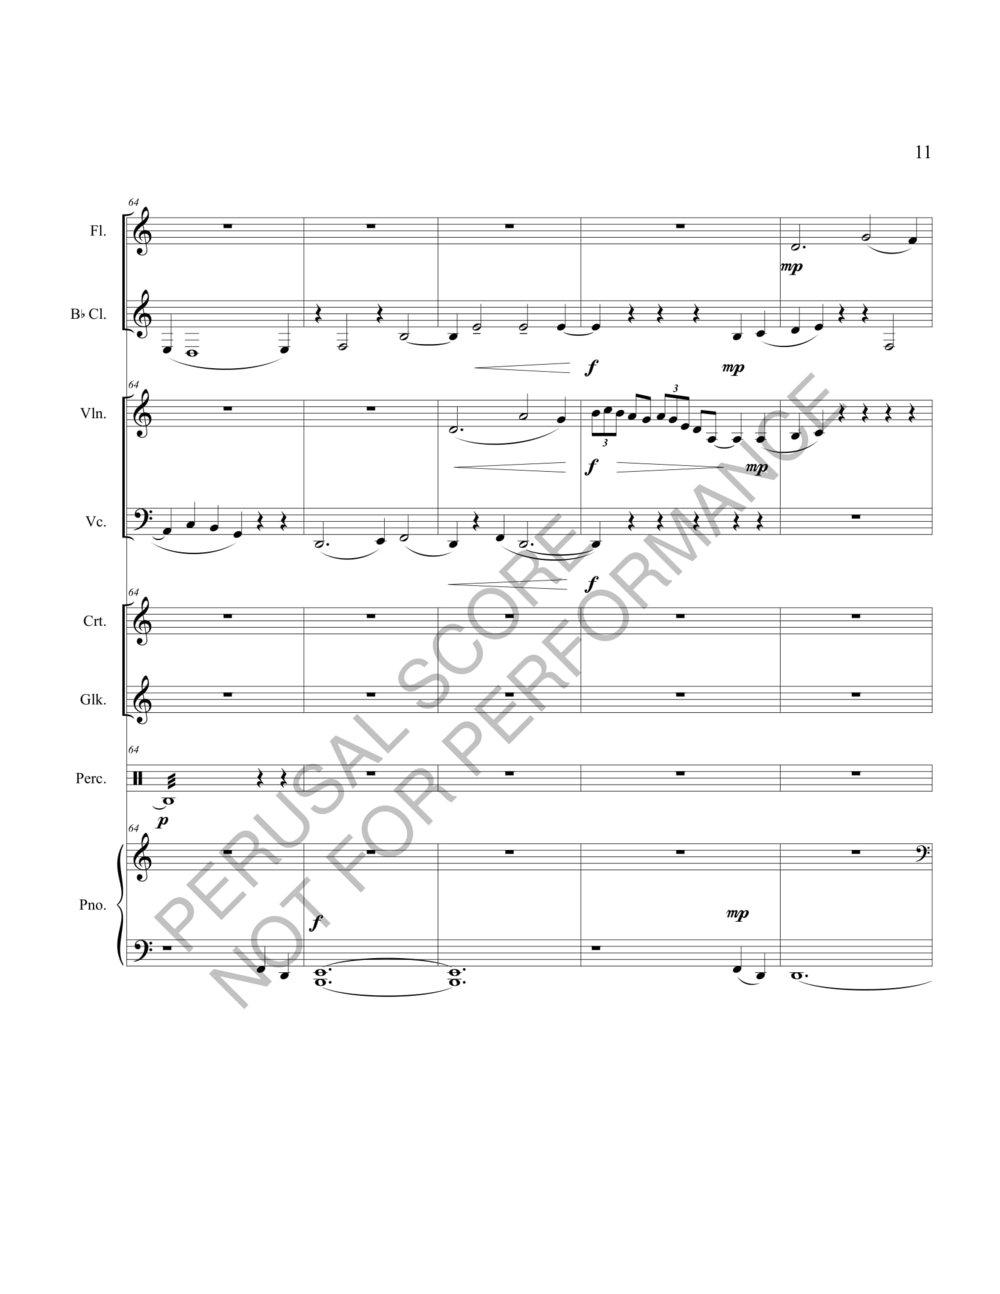 Boyd Terra Liberi Score-watermark-17.jpg